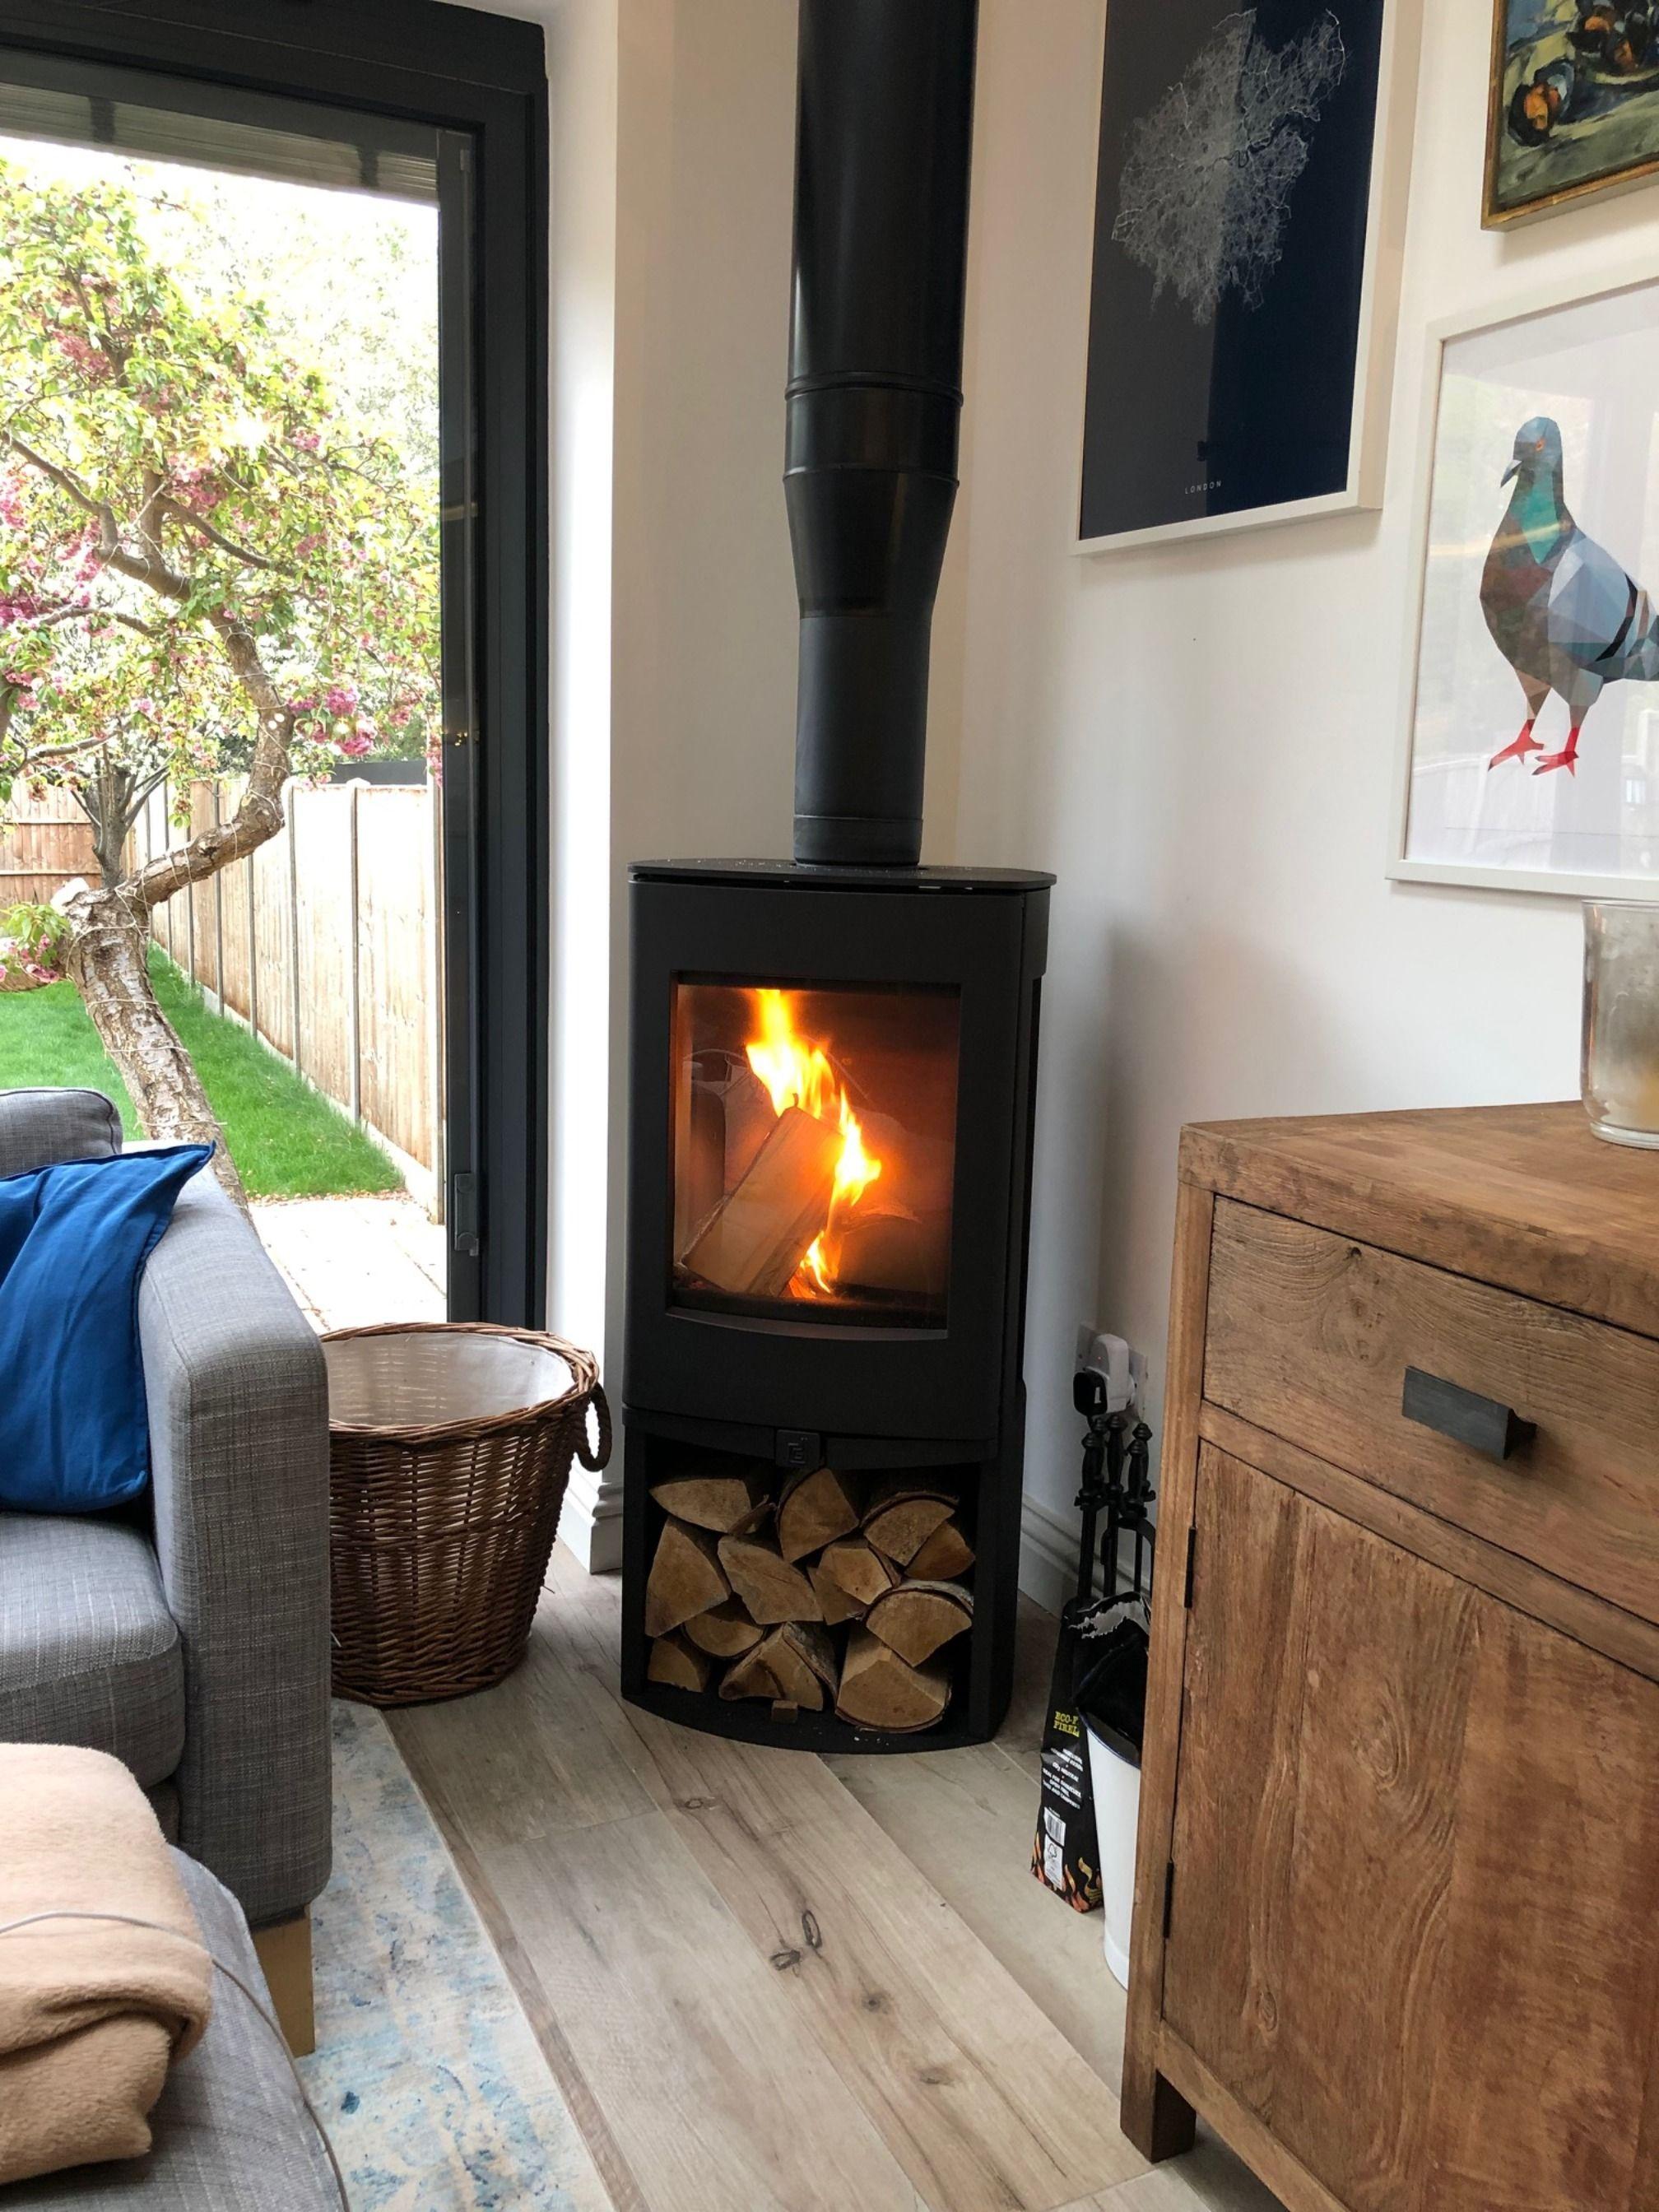 Freestanding Log Burning Stove Installation Bushey Watford In 2020 Freestanding Fireplace Wood Burning Stoves Living Room Build A Fireplace